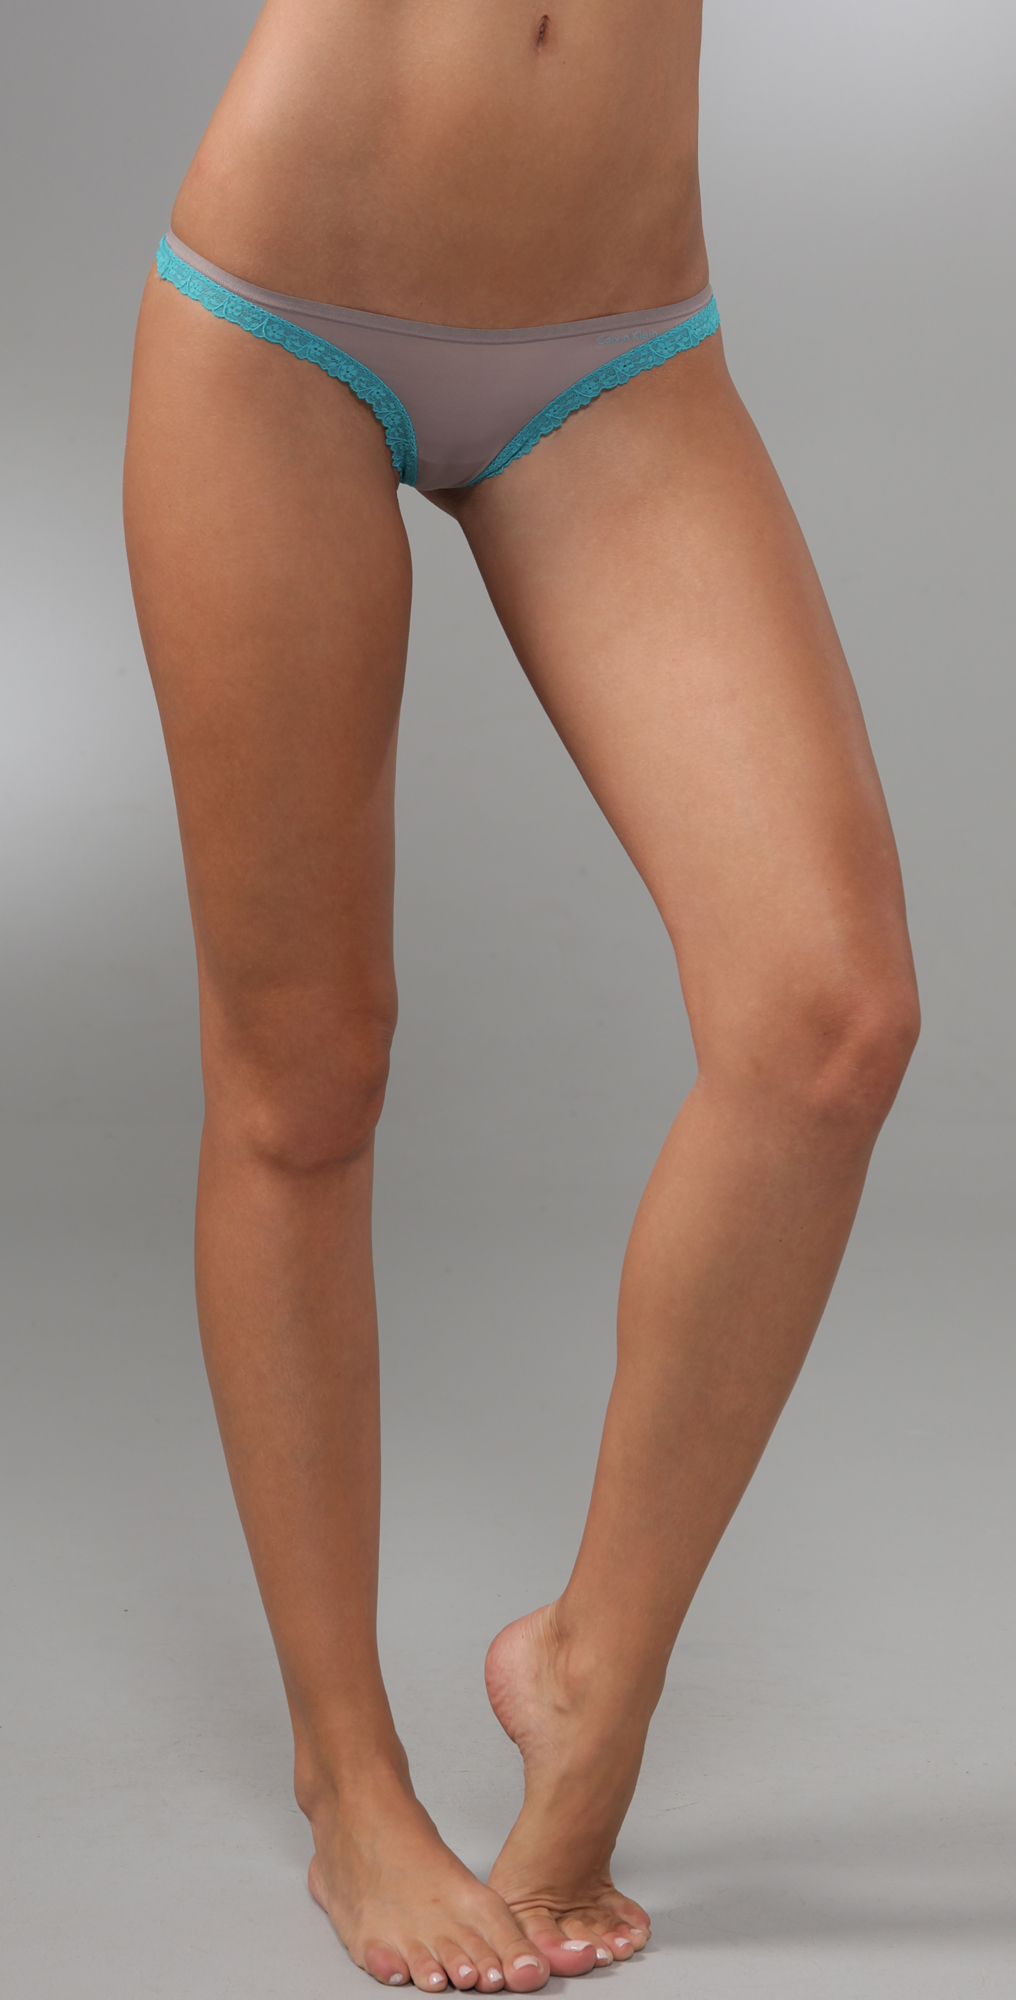 Yoga Pants Ultra Low Rise Yoga Pants Cklen2016730210 p1 1 0 Jpg